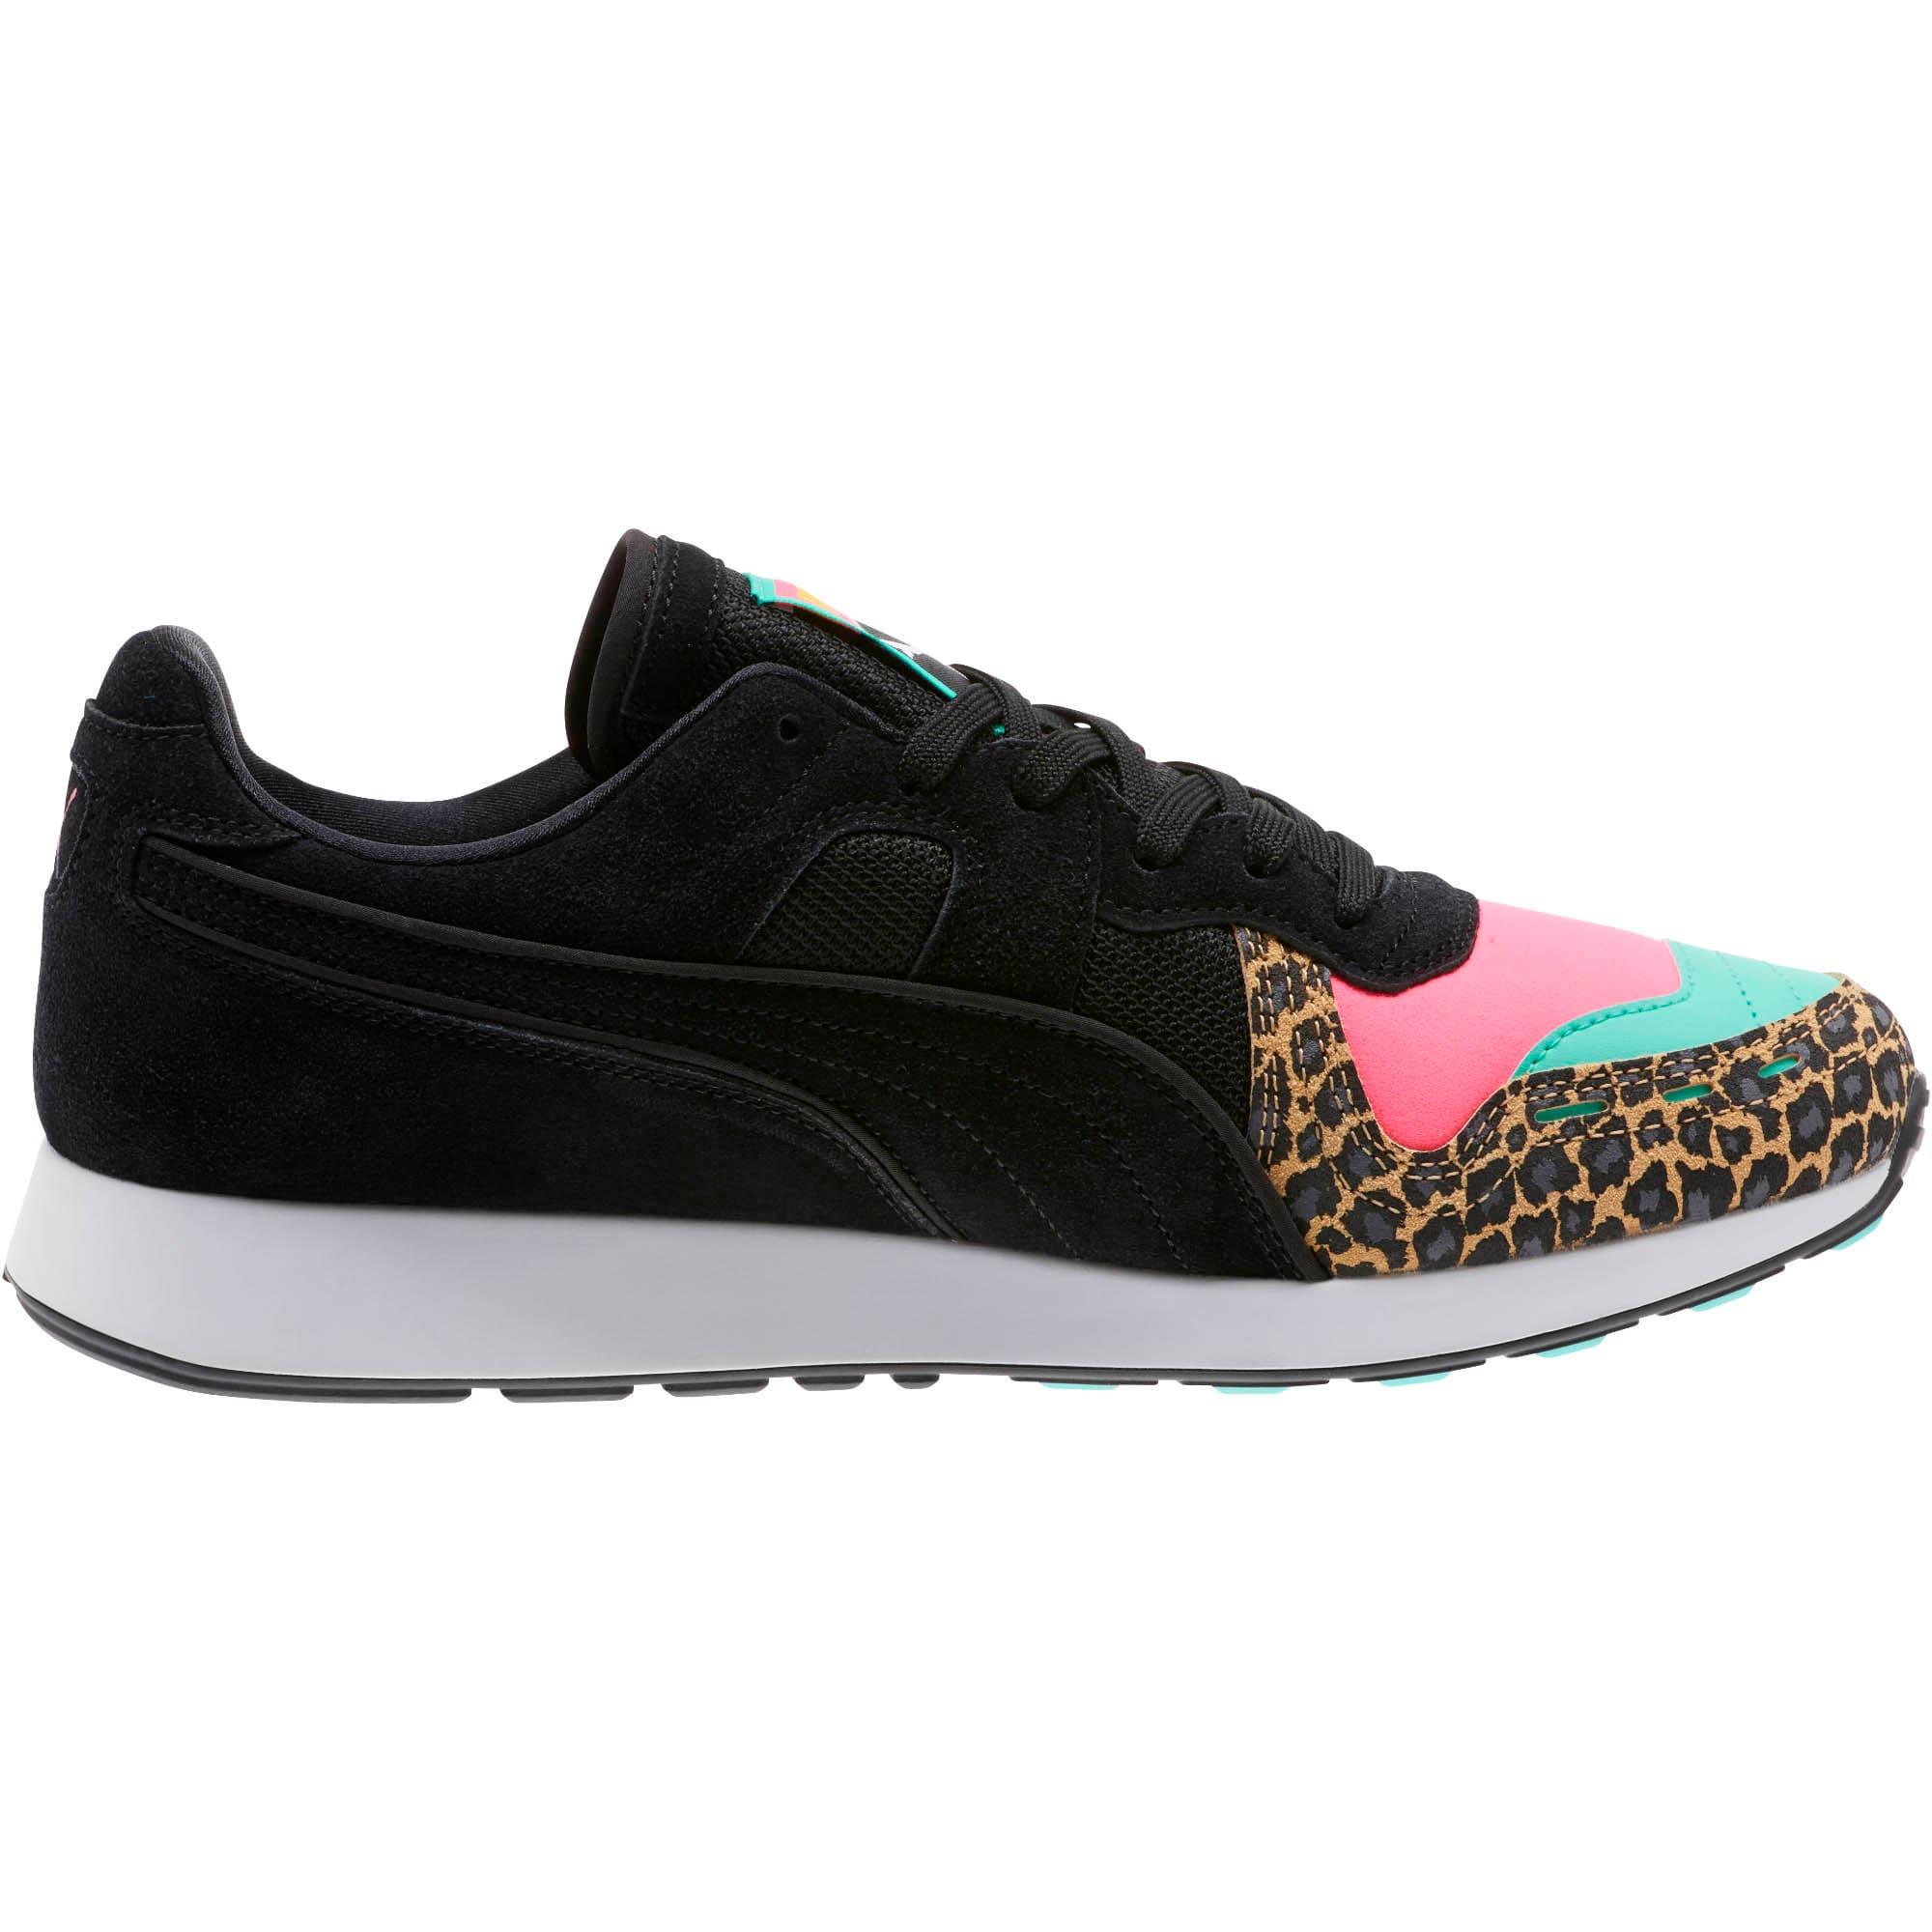 Thumbnail 3 of RS-100 Party Cheetah Sneakers, KNOCKOUT PINK-Puma Black, medium